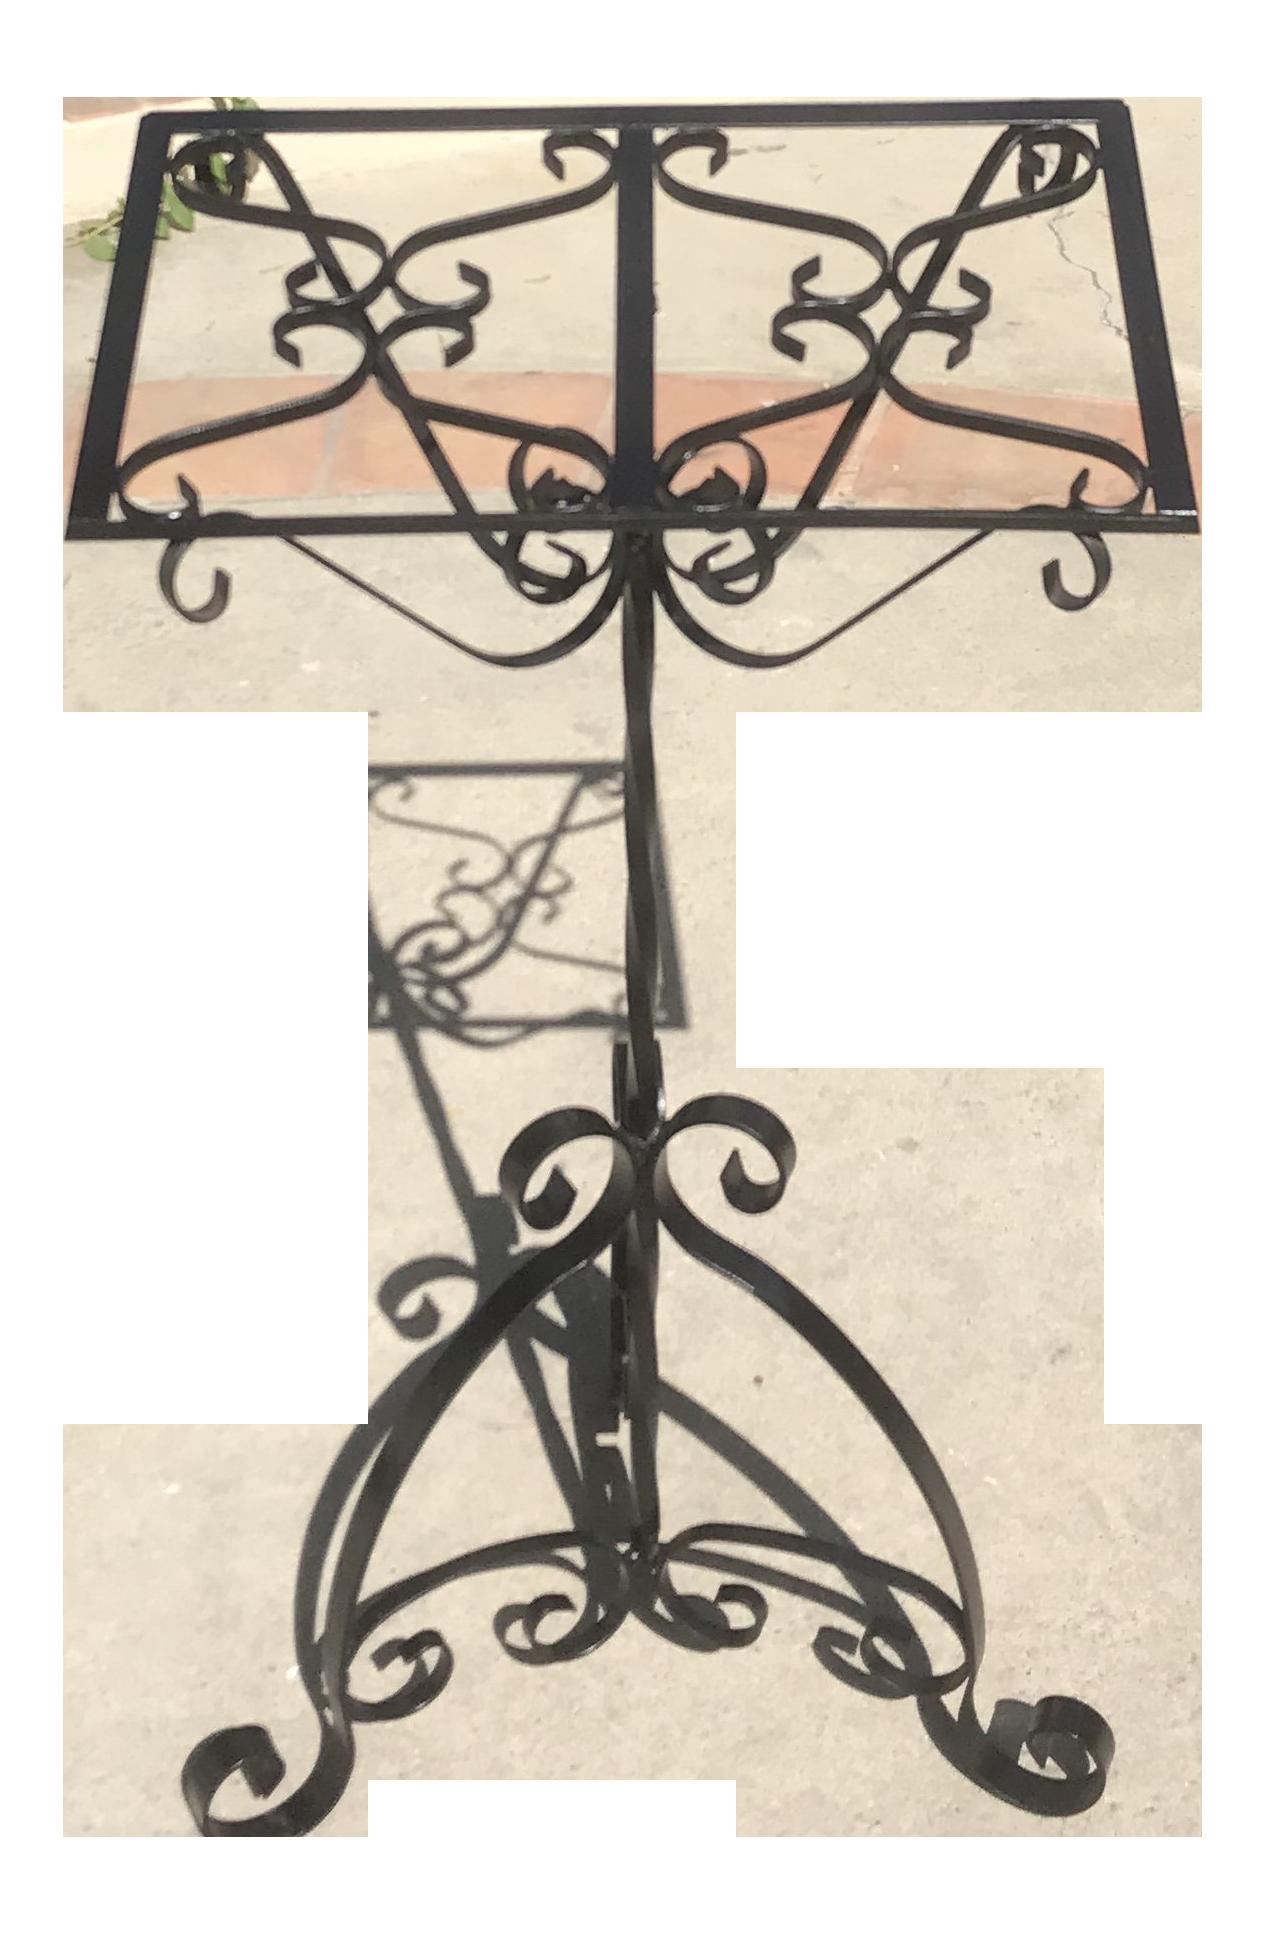 Vintage Wrought Iron Music Stand Chairish